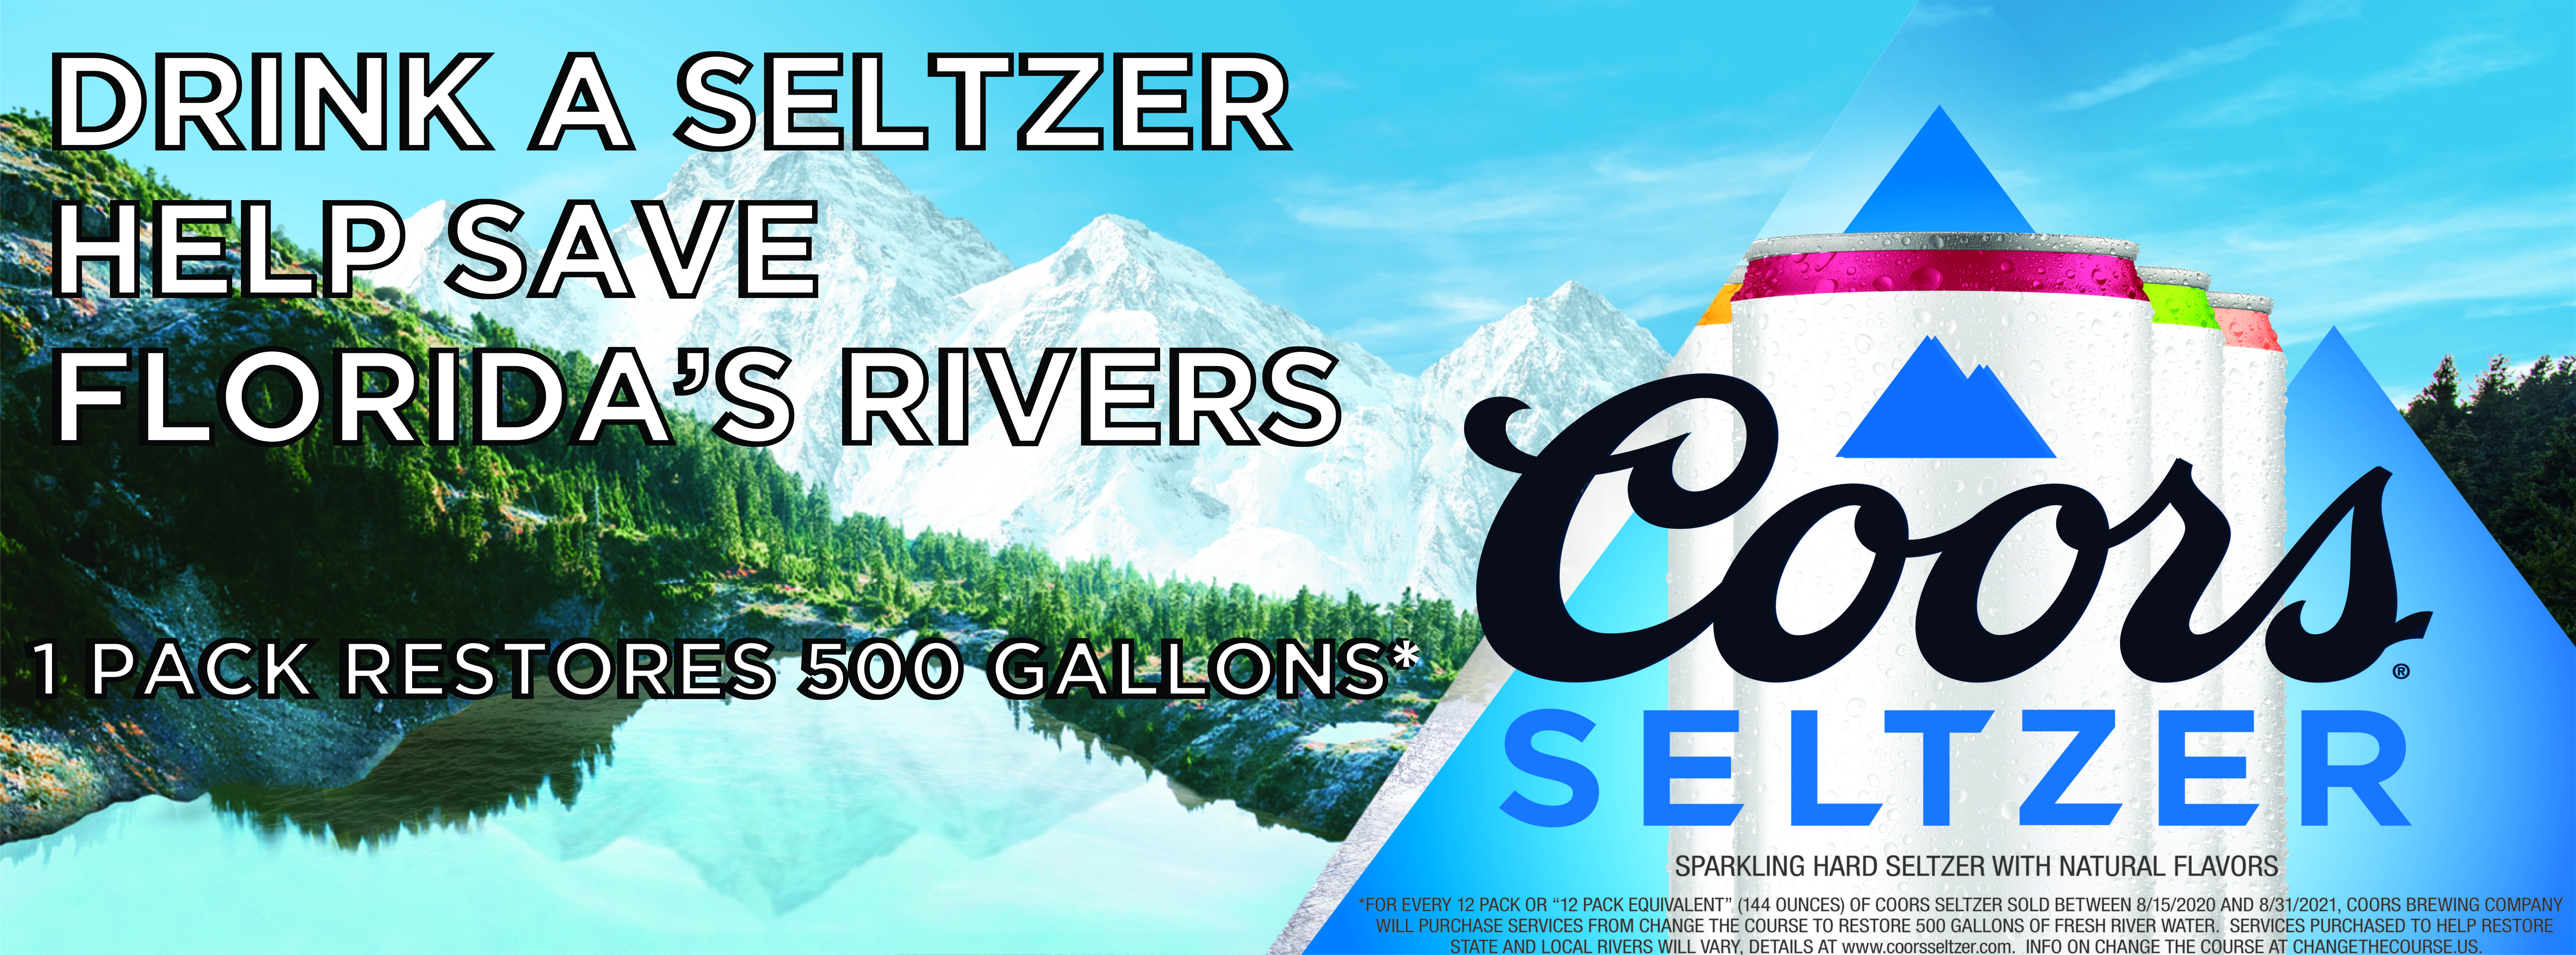 Coors Seltzer Florida Rivers